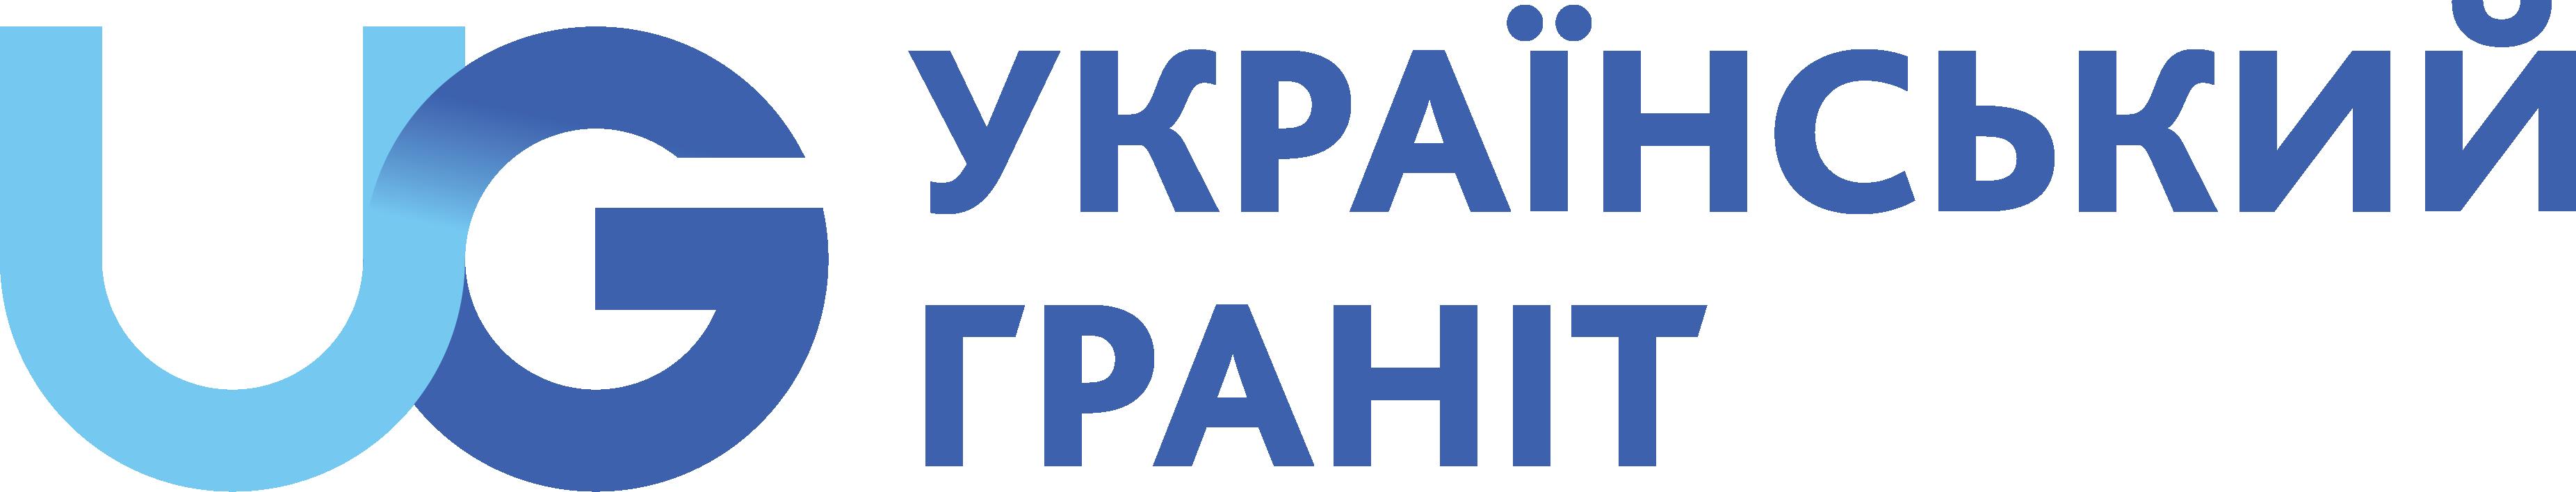 UKRGRAN